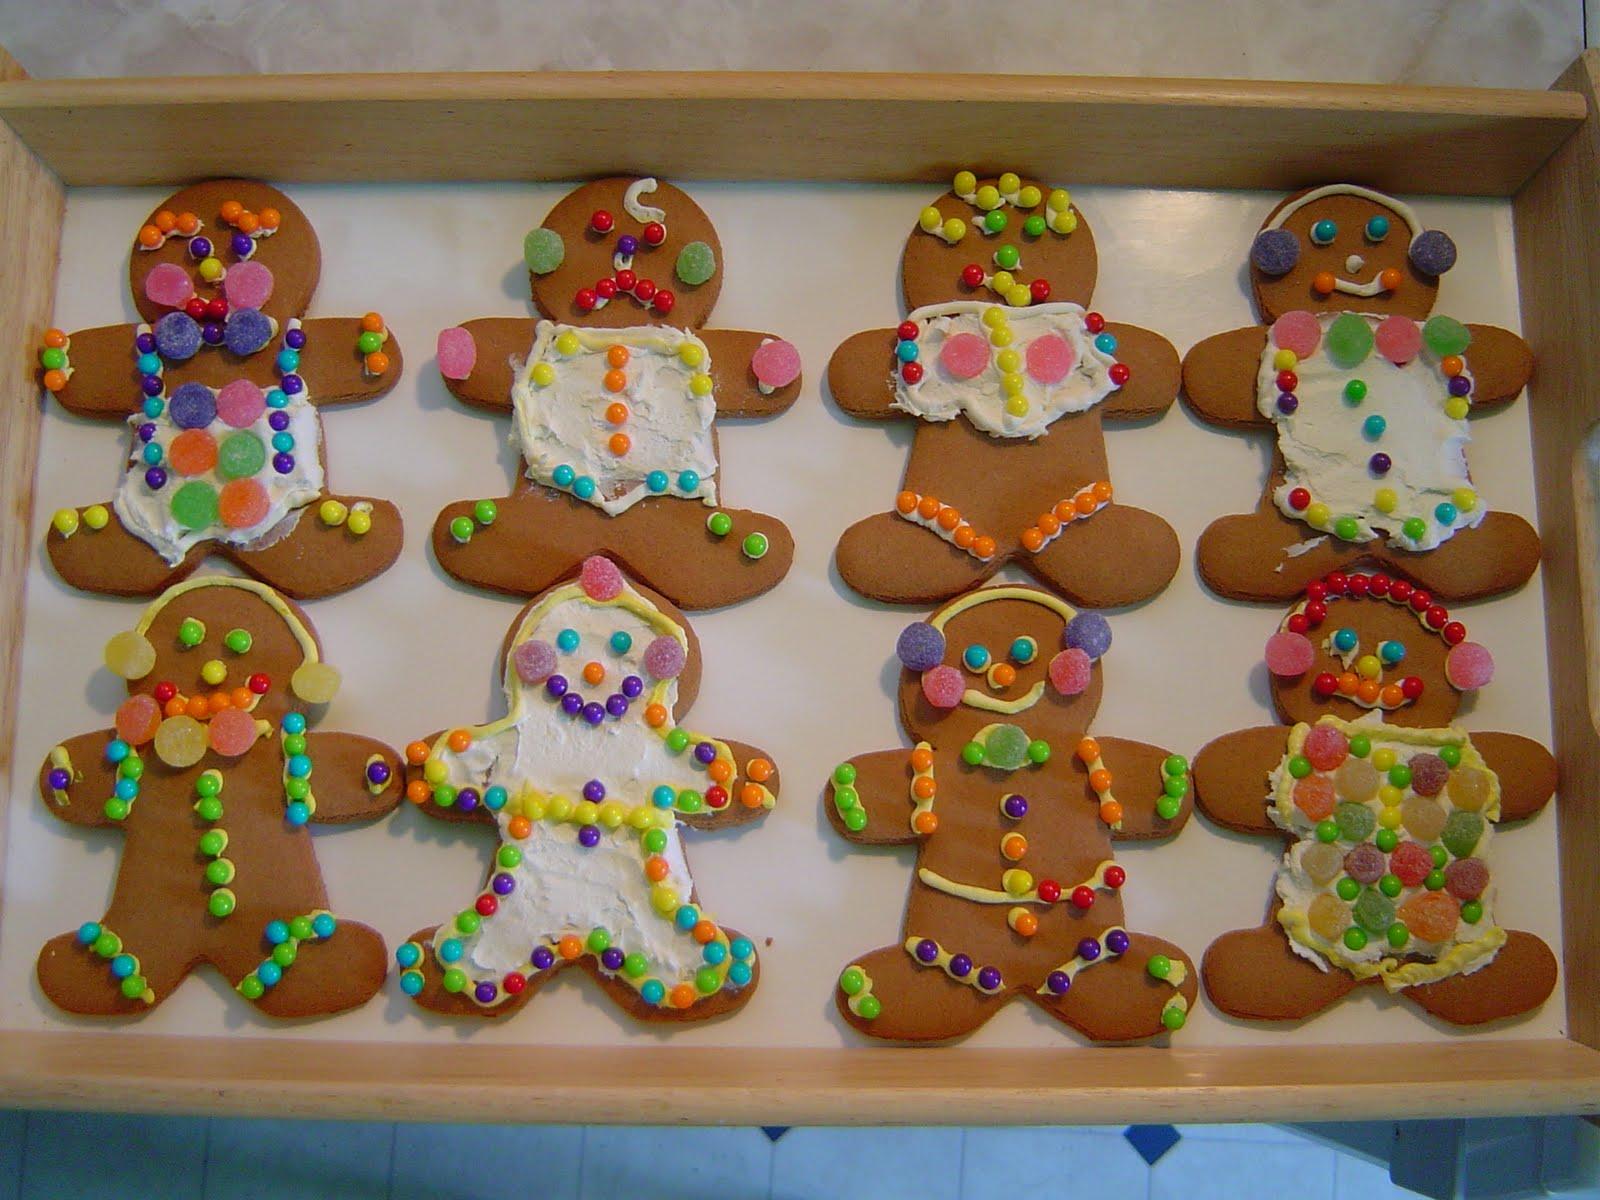 Bob 39 s bad golf decorating gingerbread man cookies in june - Decorations for gingerbread man ...